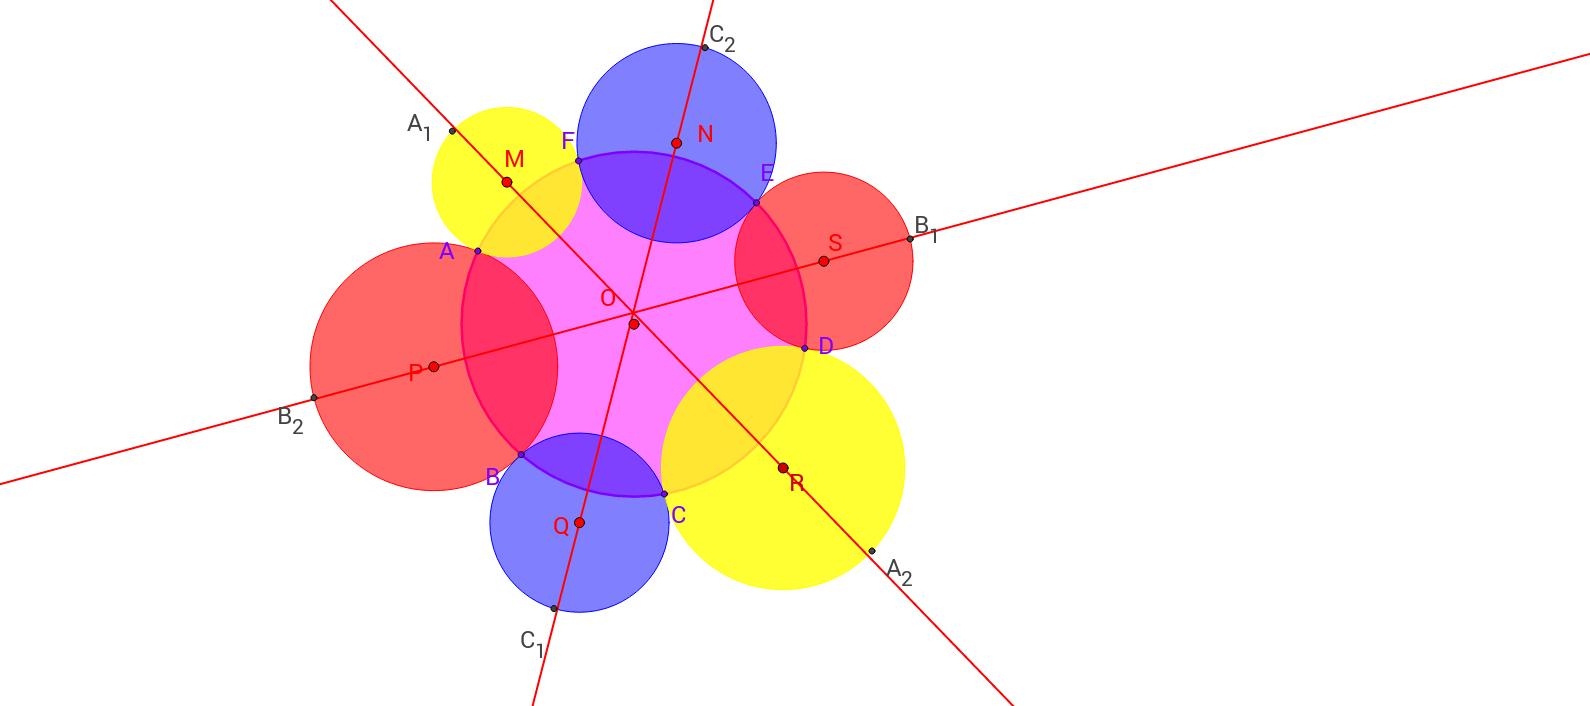 Dao's theorem on six circumcenters